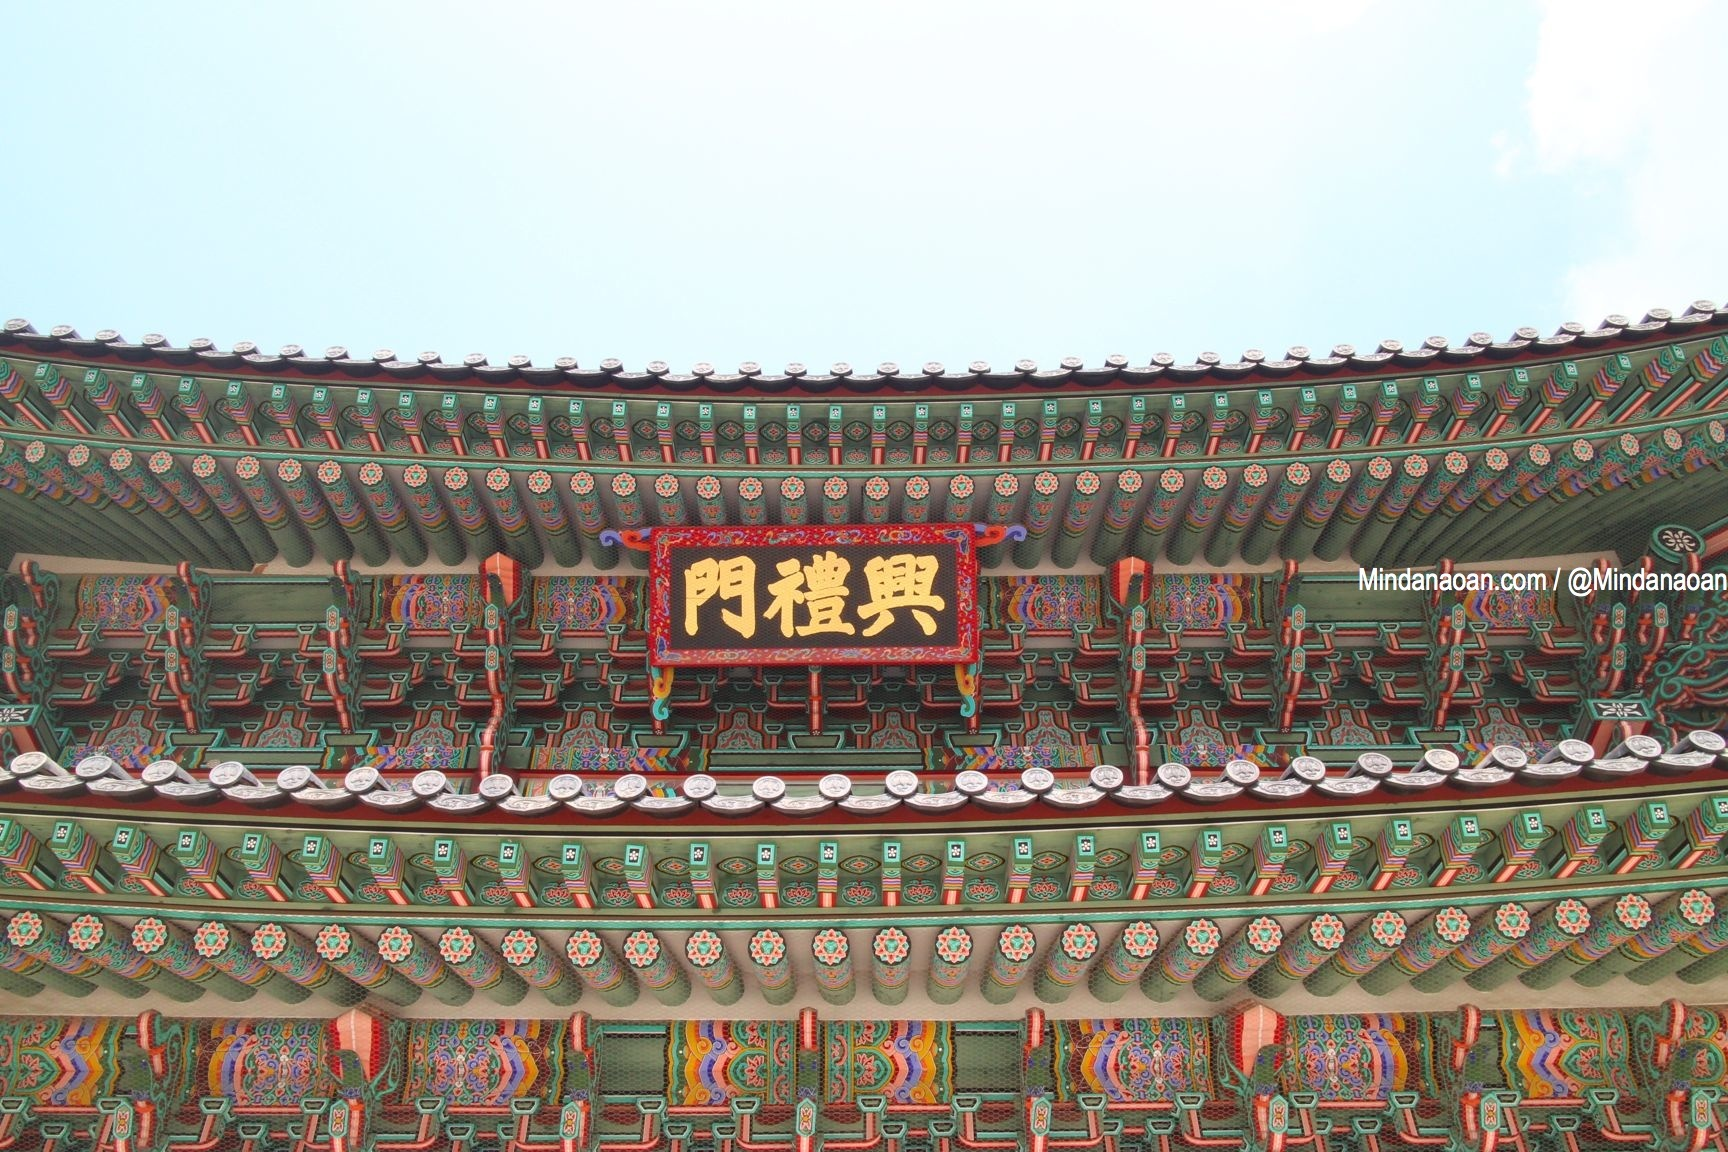 gyeongbukgung-palace-seoul-korea